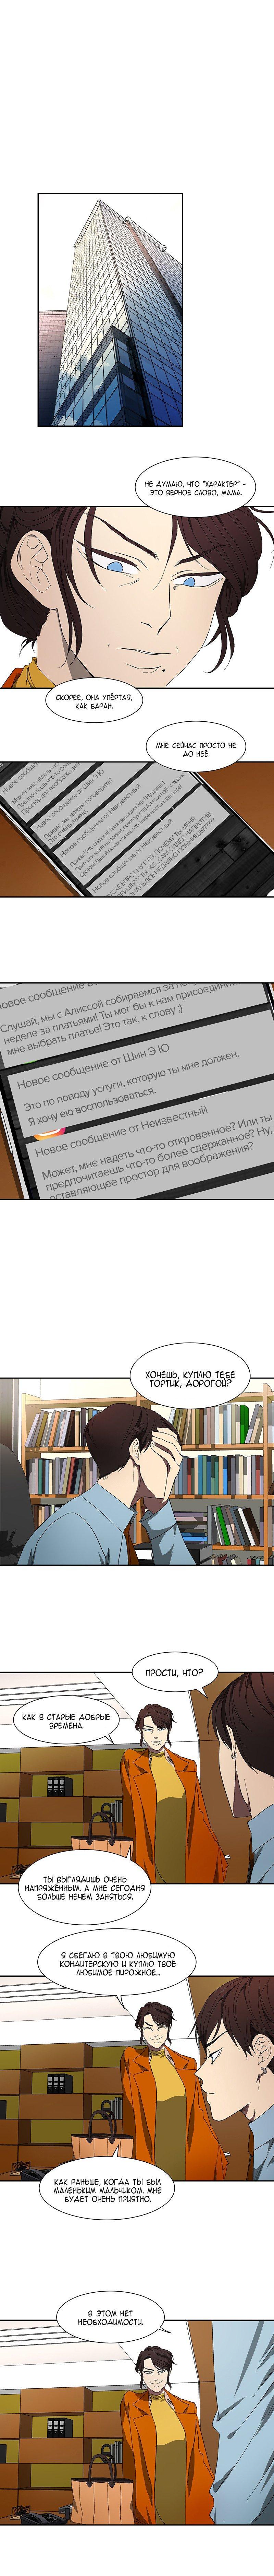 Манга Я люблю Ю / I love Yoo  - Том 1 Глава 47 Страница 4